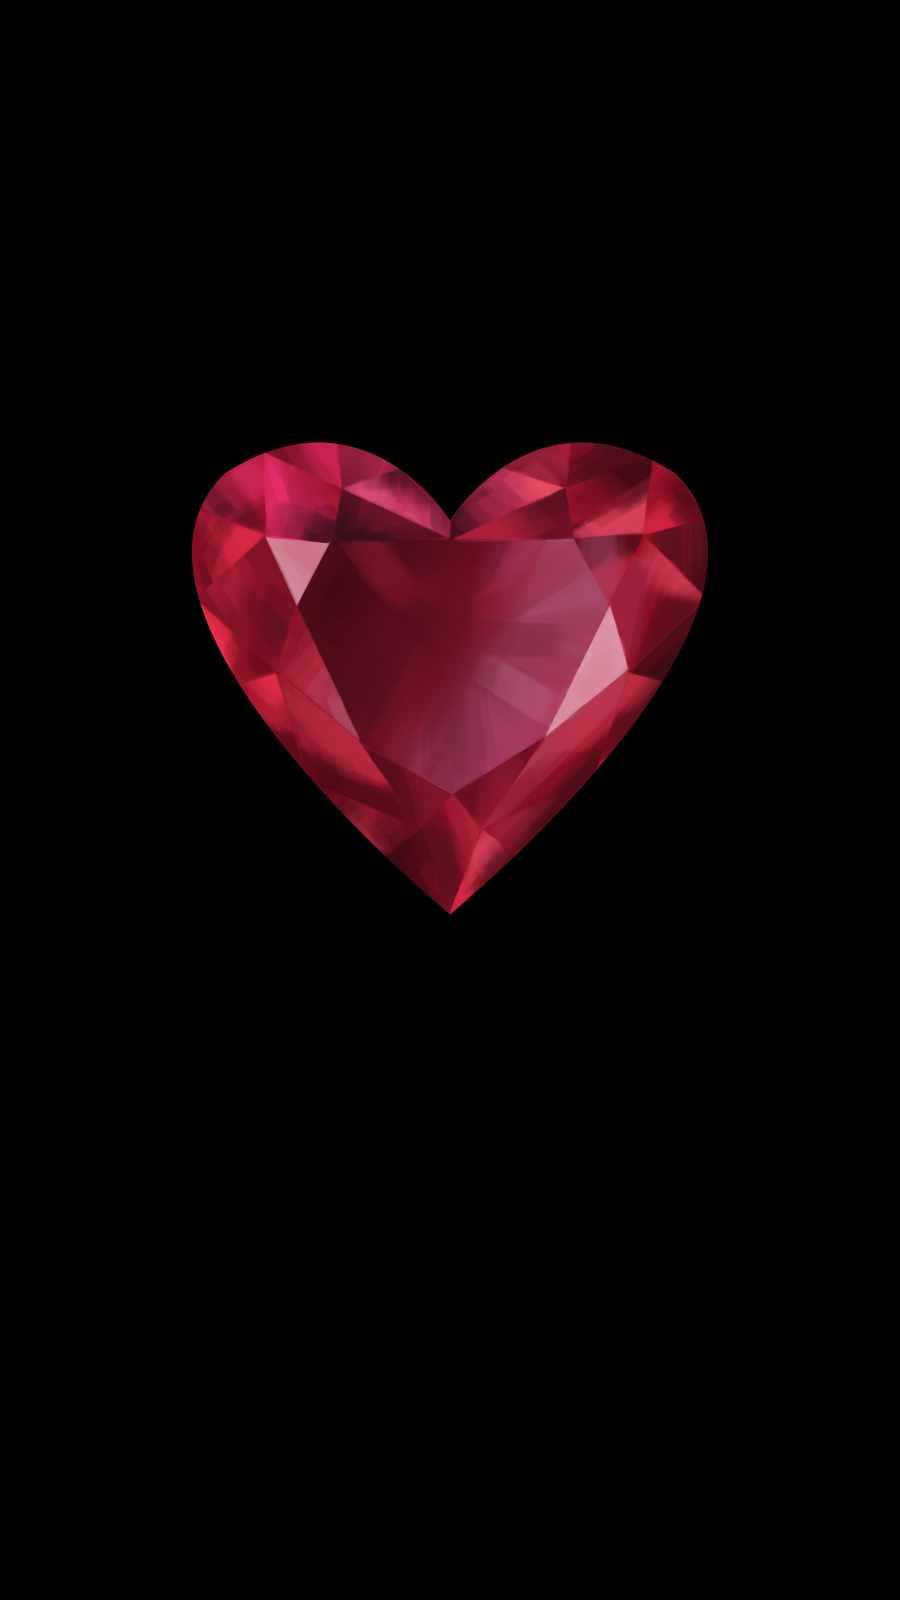 Diamond Heart iPhone Wallpaper